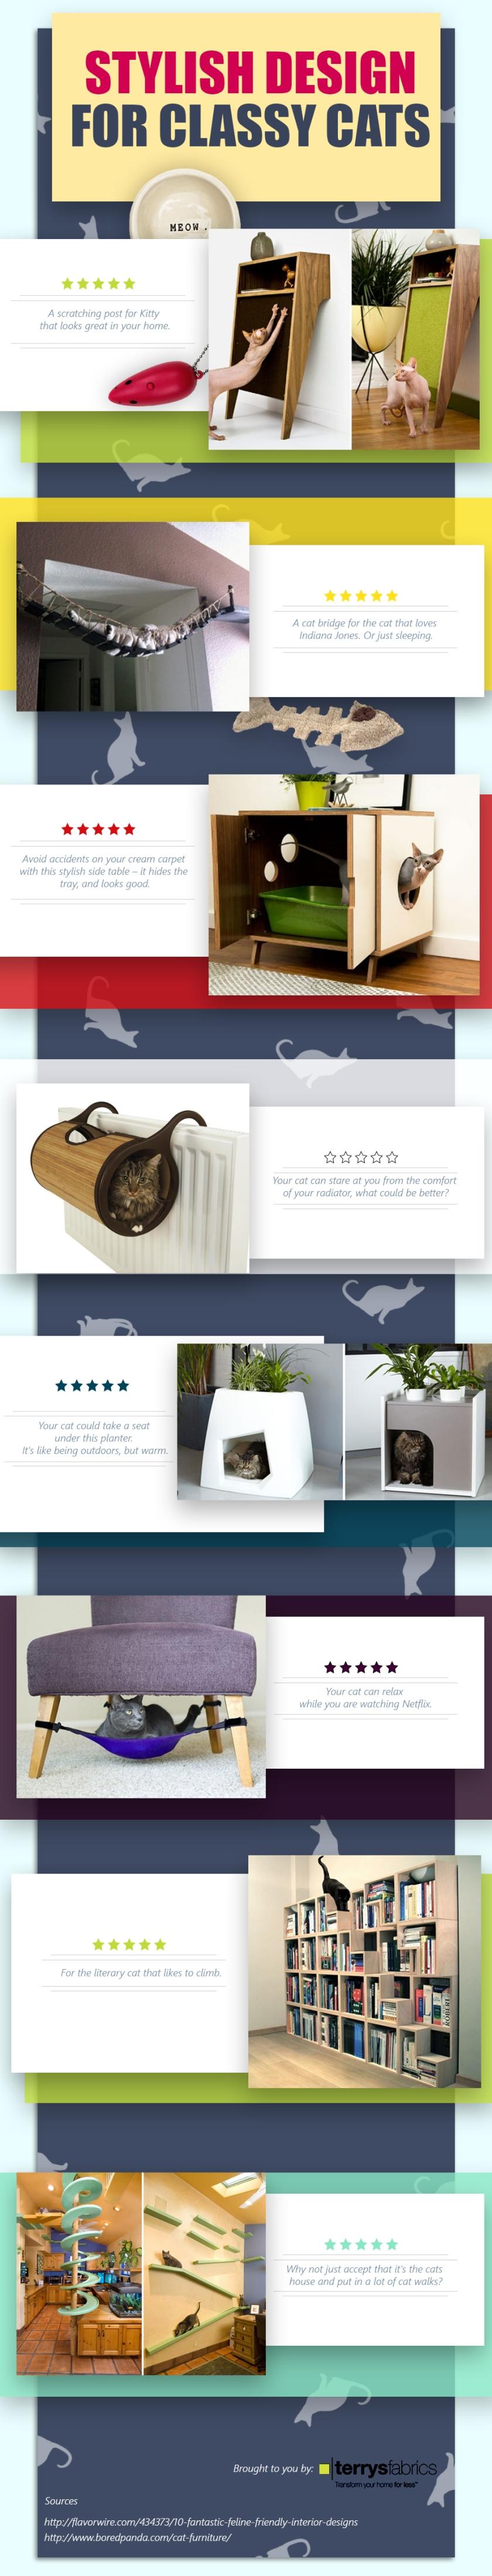 stylish-design-for-classy-cats.jpg